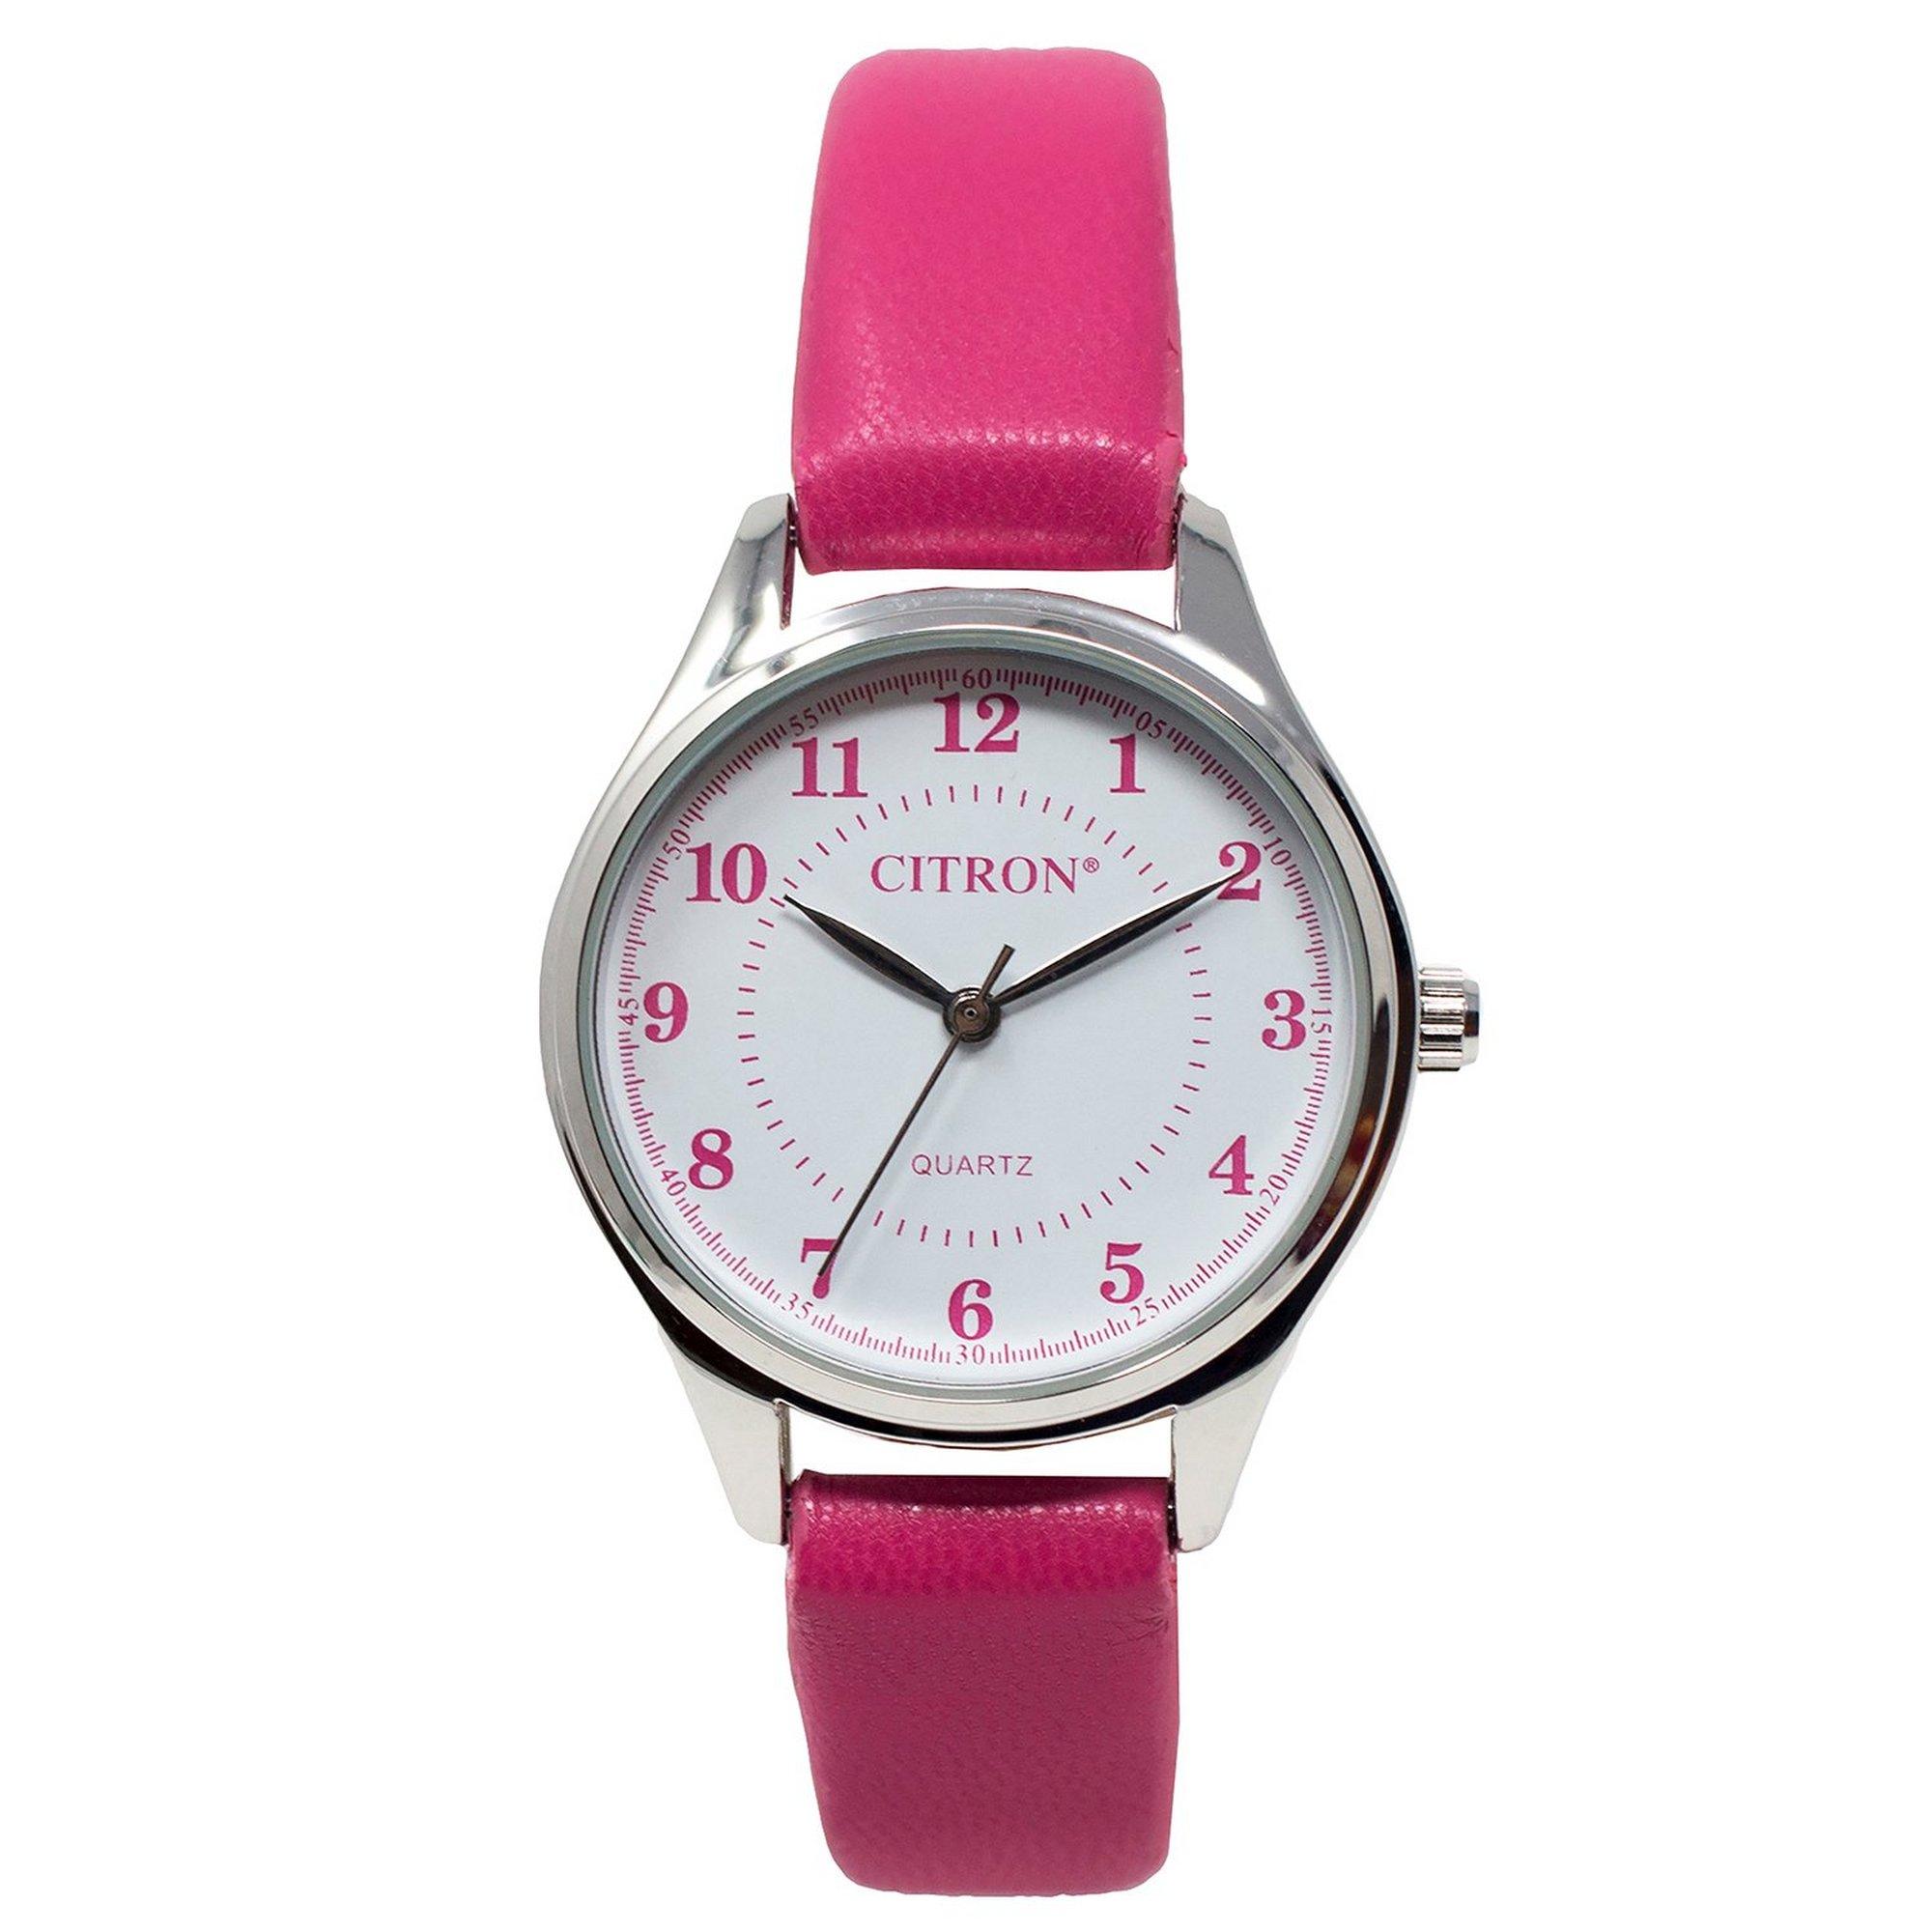 Image of Citron Pink Strap Analogue Watch